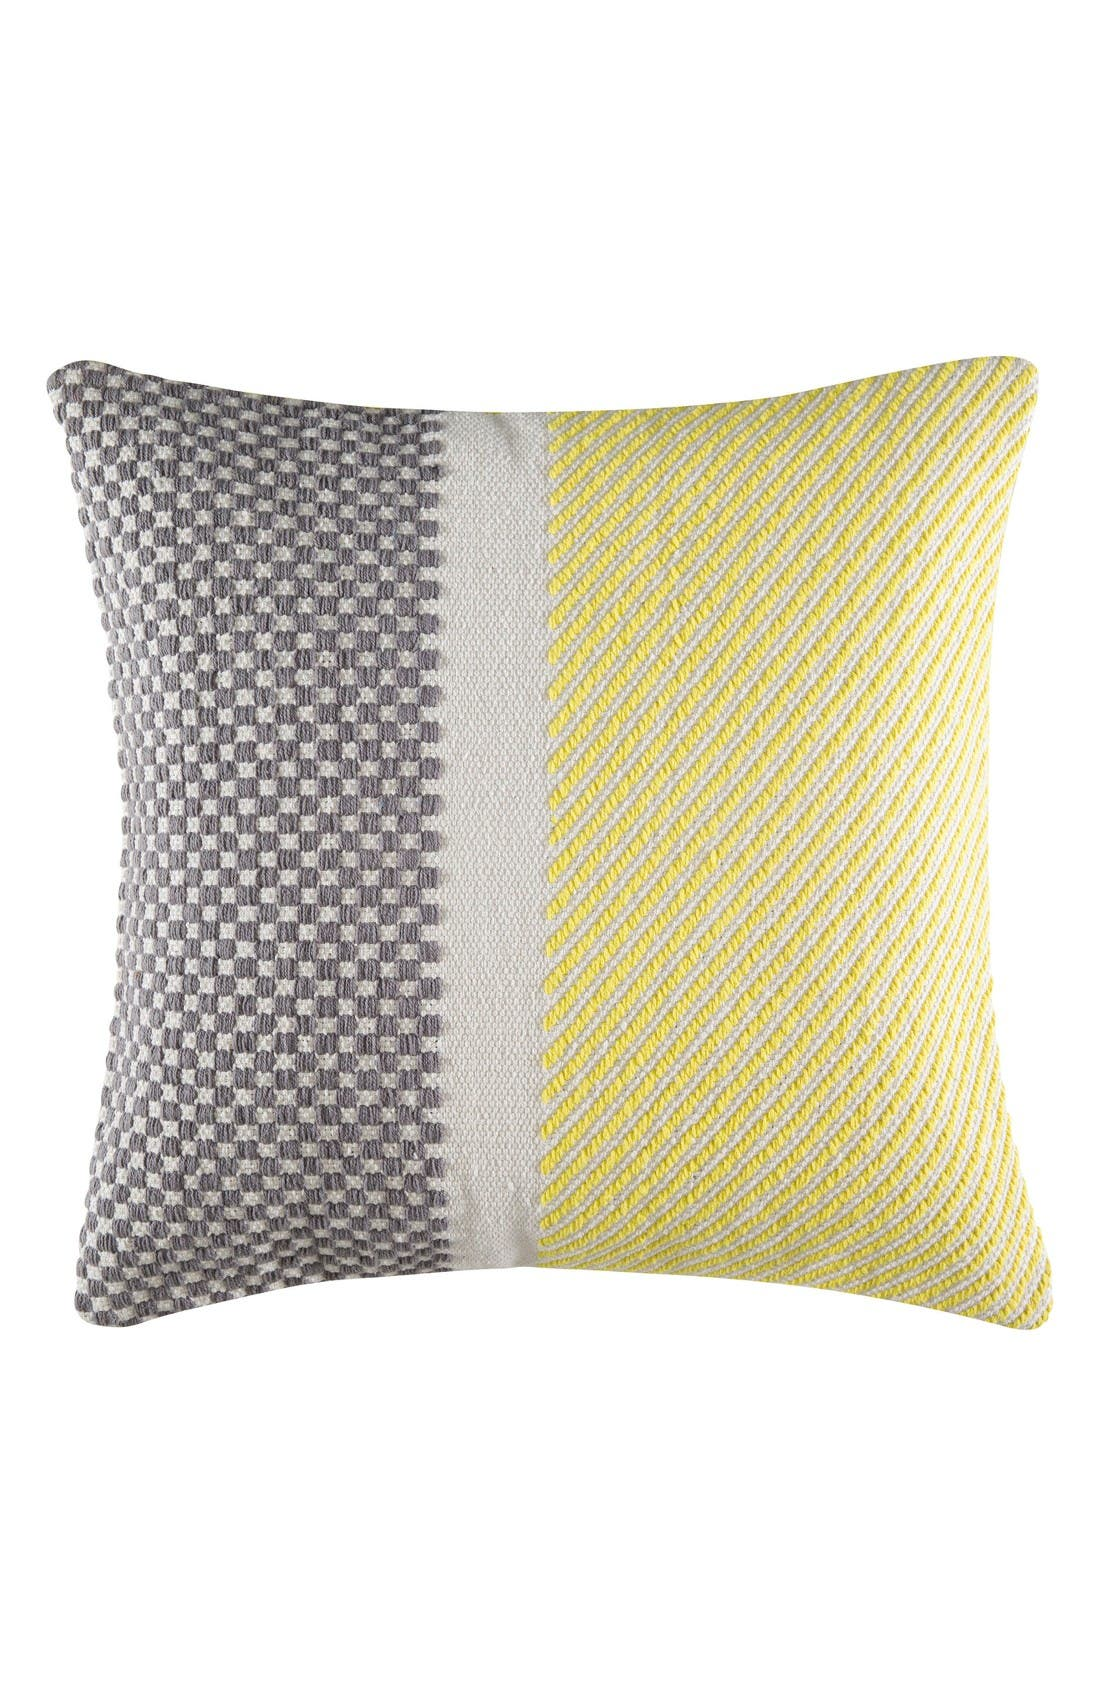 Main Image - KAS Designs Riley Jax Pillow